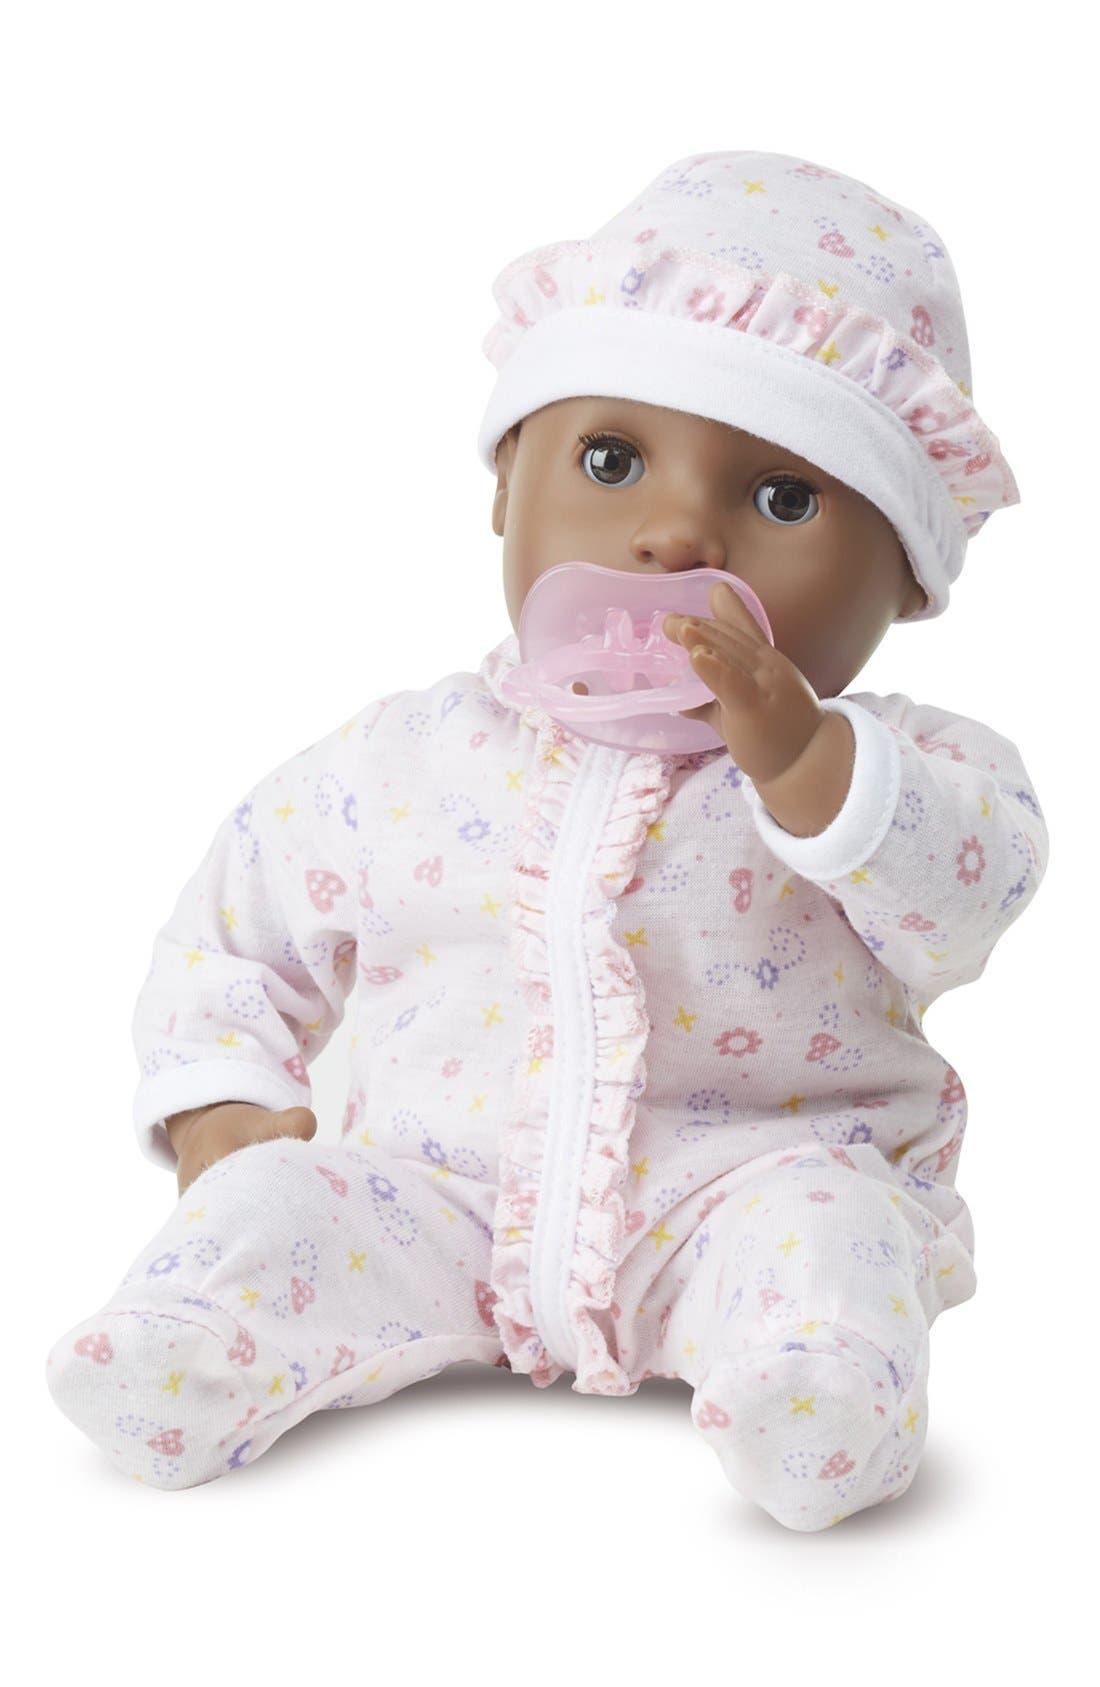 Main Image - Melissa & Doug 'Mine to Love - Gabrielle' Baby Doll